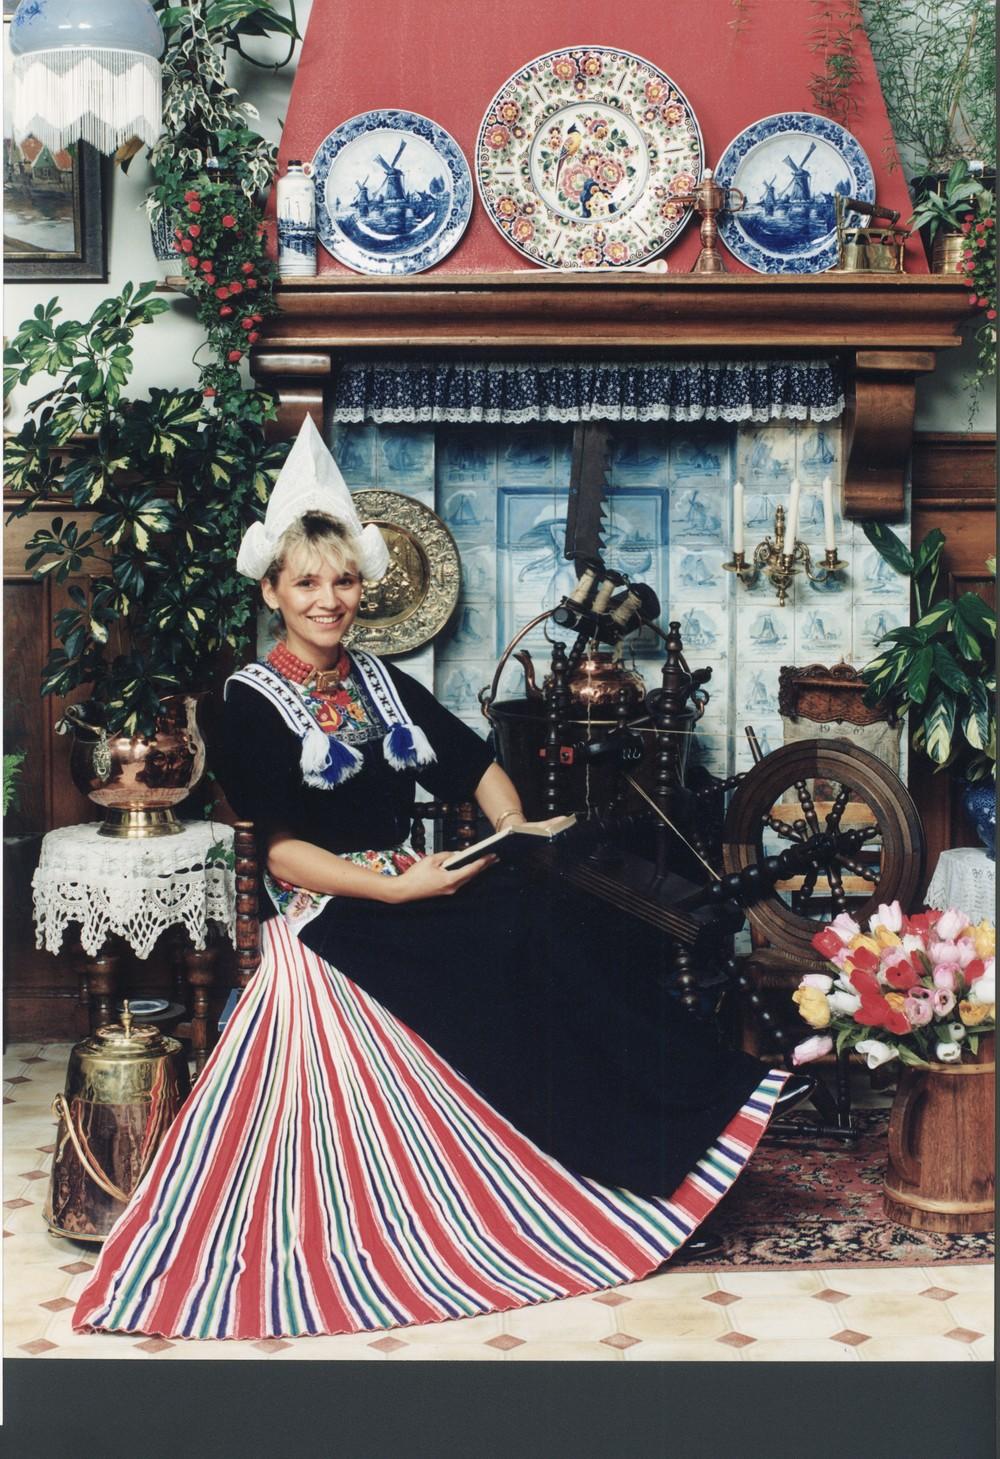 Tatjana Simic op de foto in Volendams kostuum